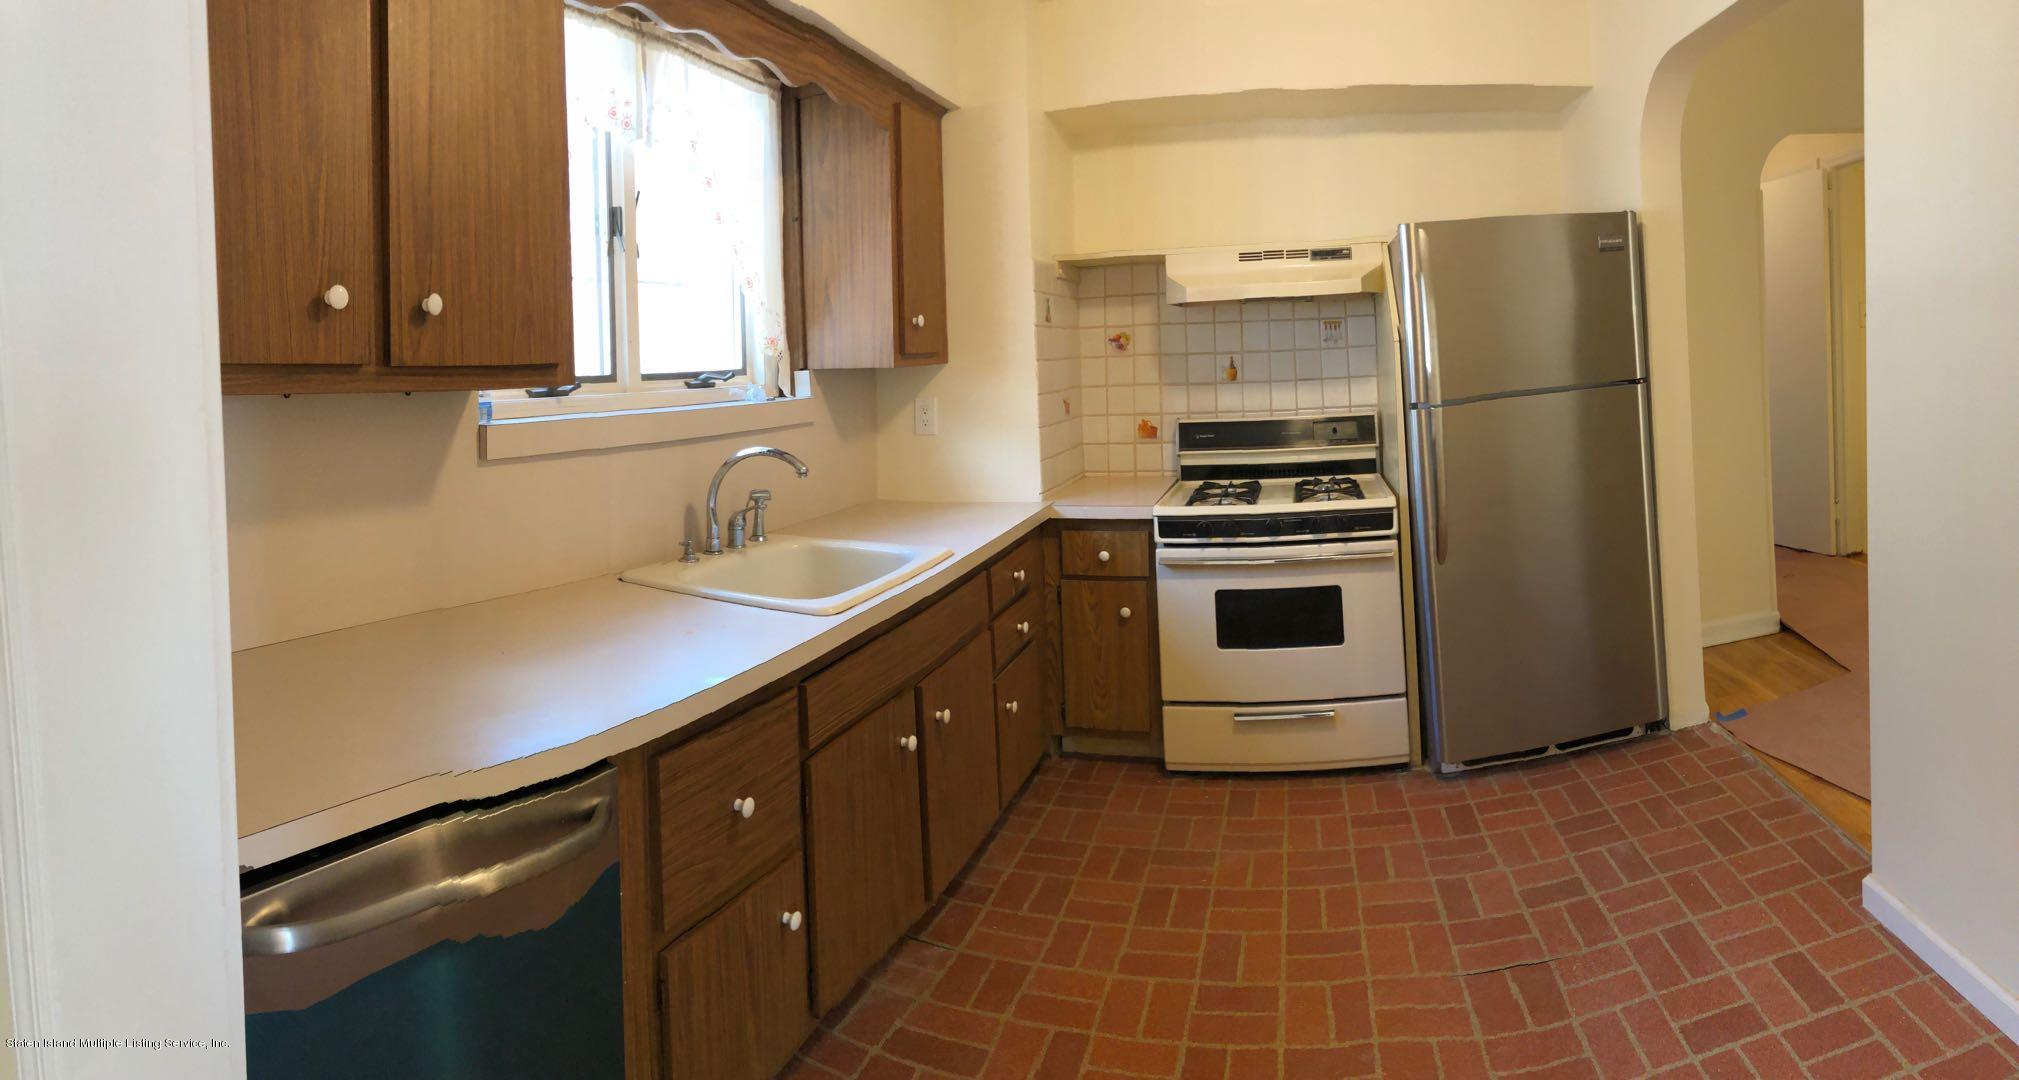 Two Family - Detached 27 Arthur Avenue  Staten Island, NY 10305, MLS-1128566-7